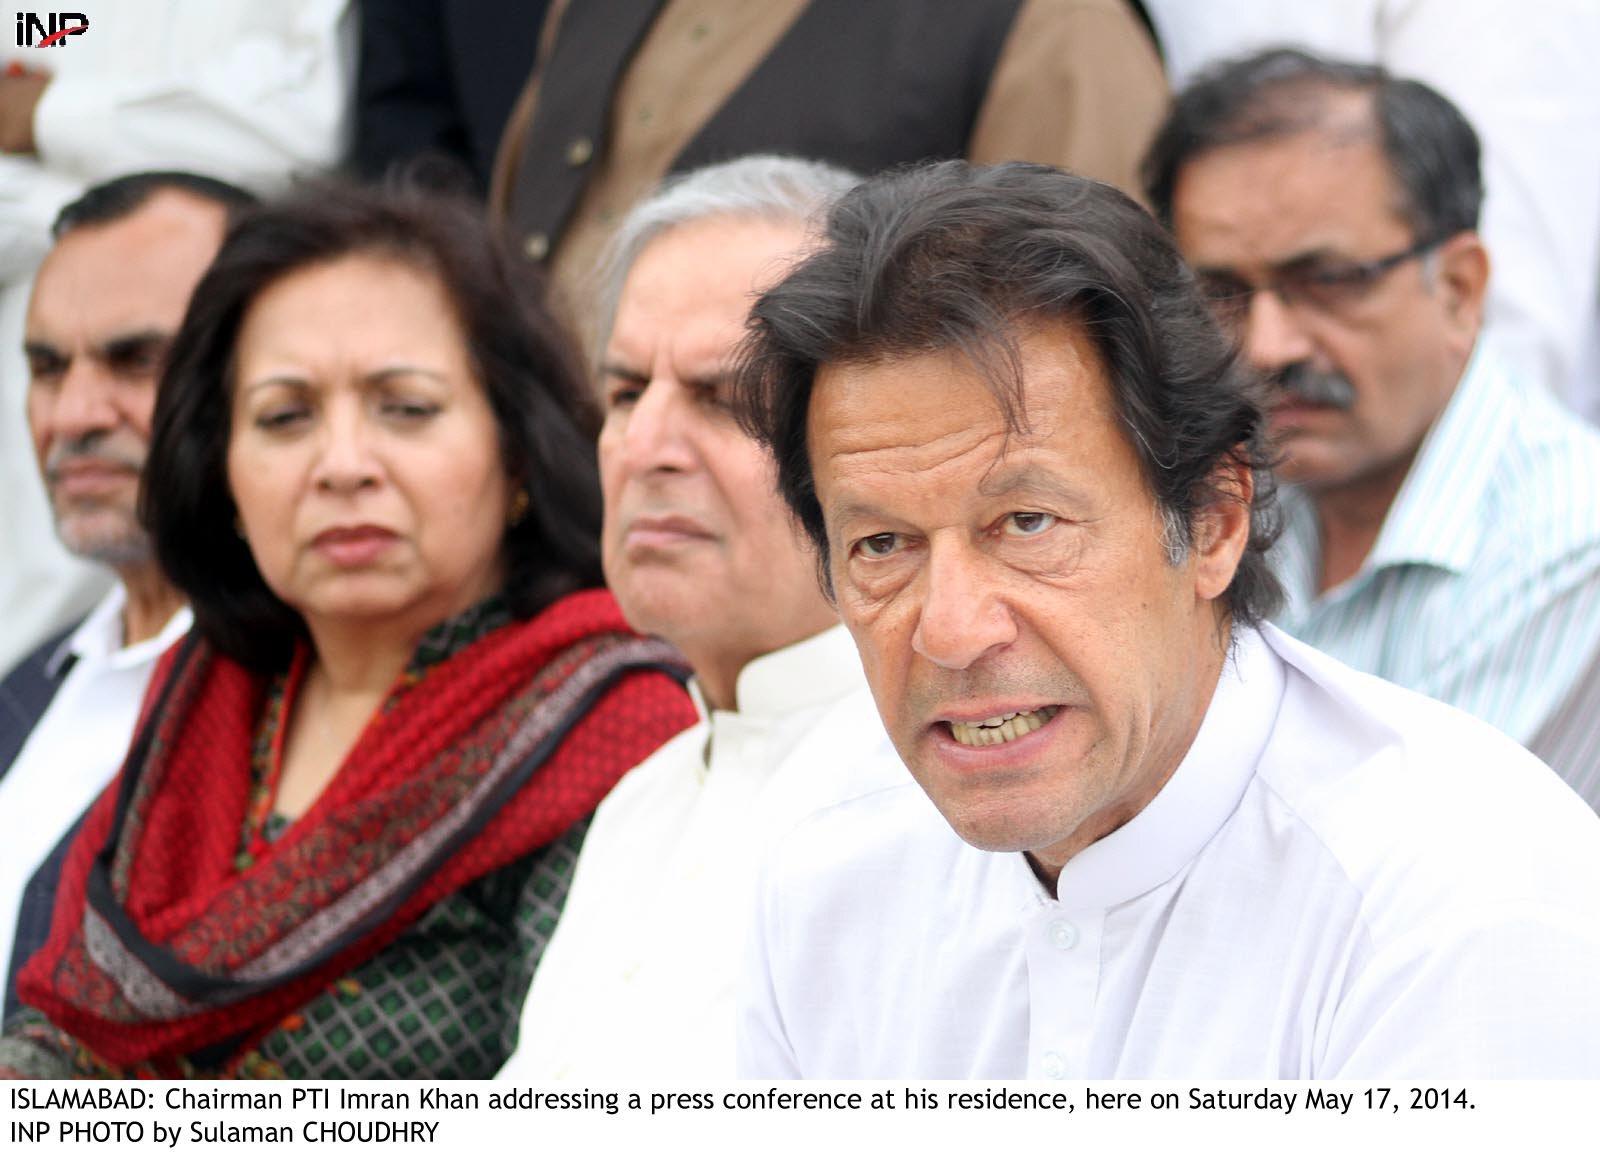 Pakistan Tehreek-e-Insaf chairperson Imran Khan. PHOTO: INP